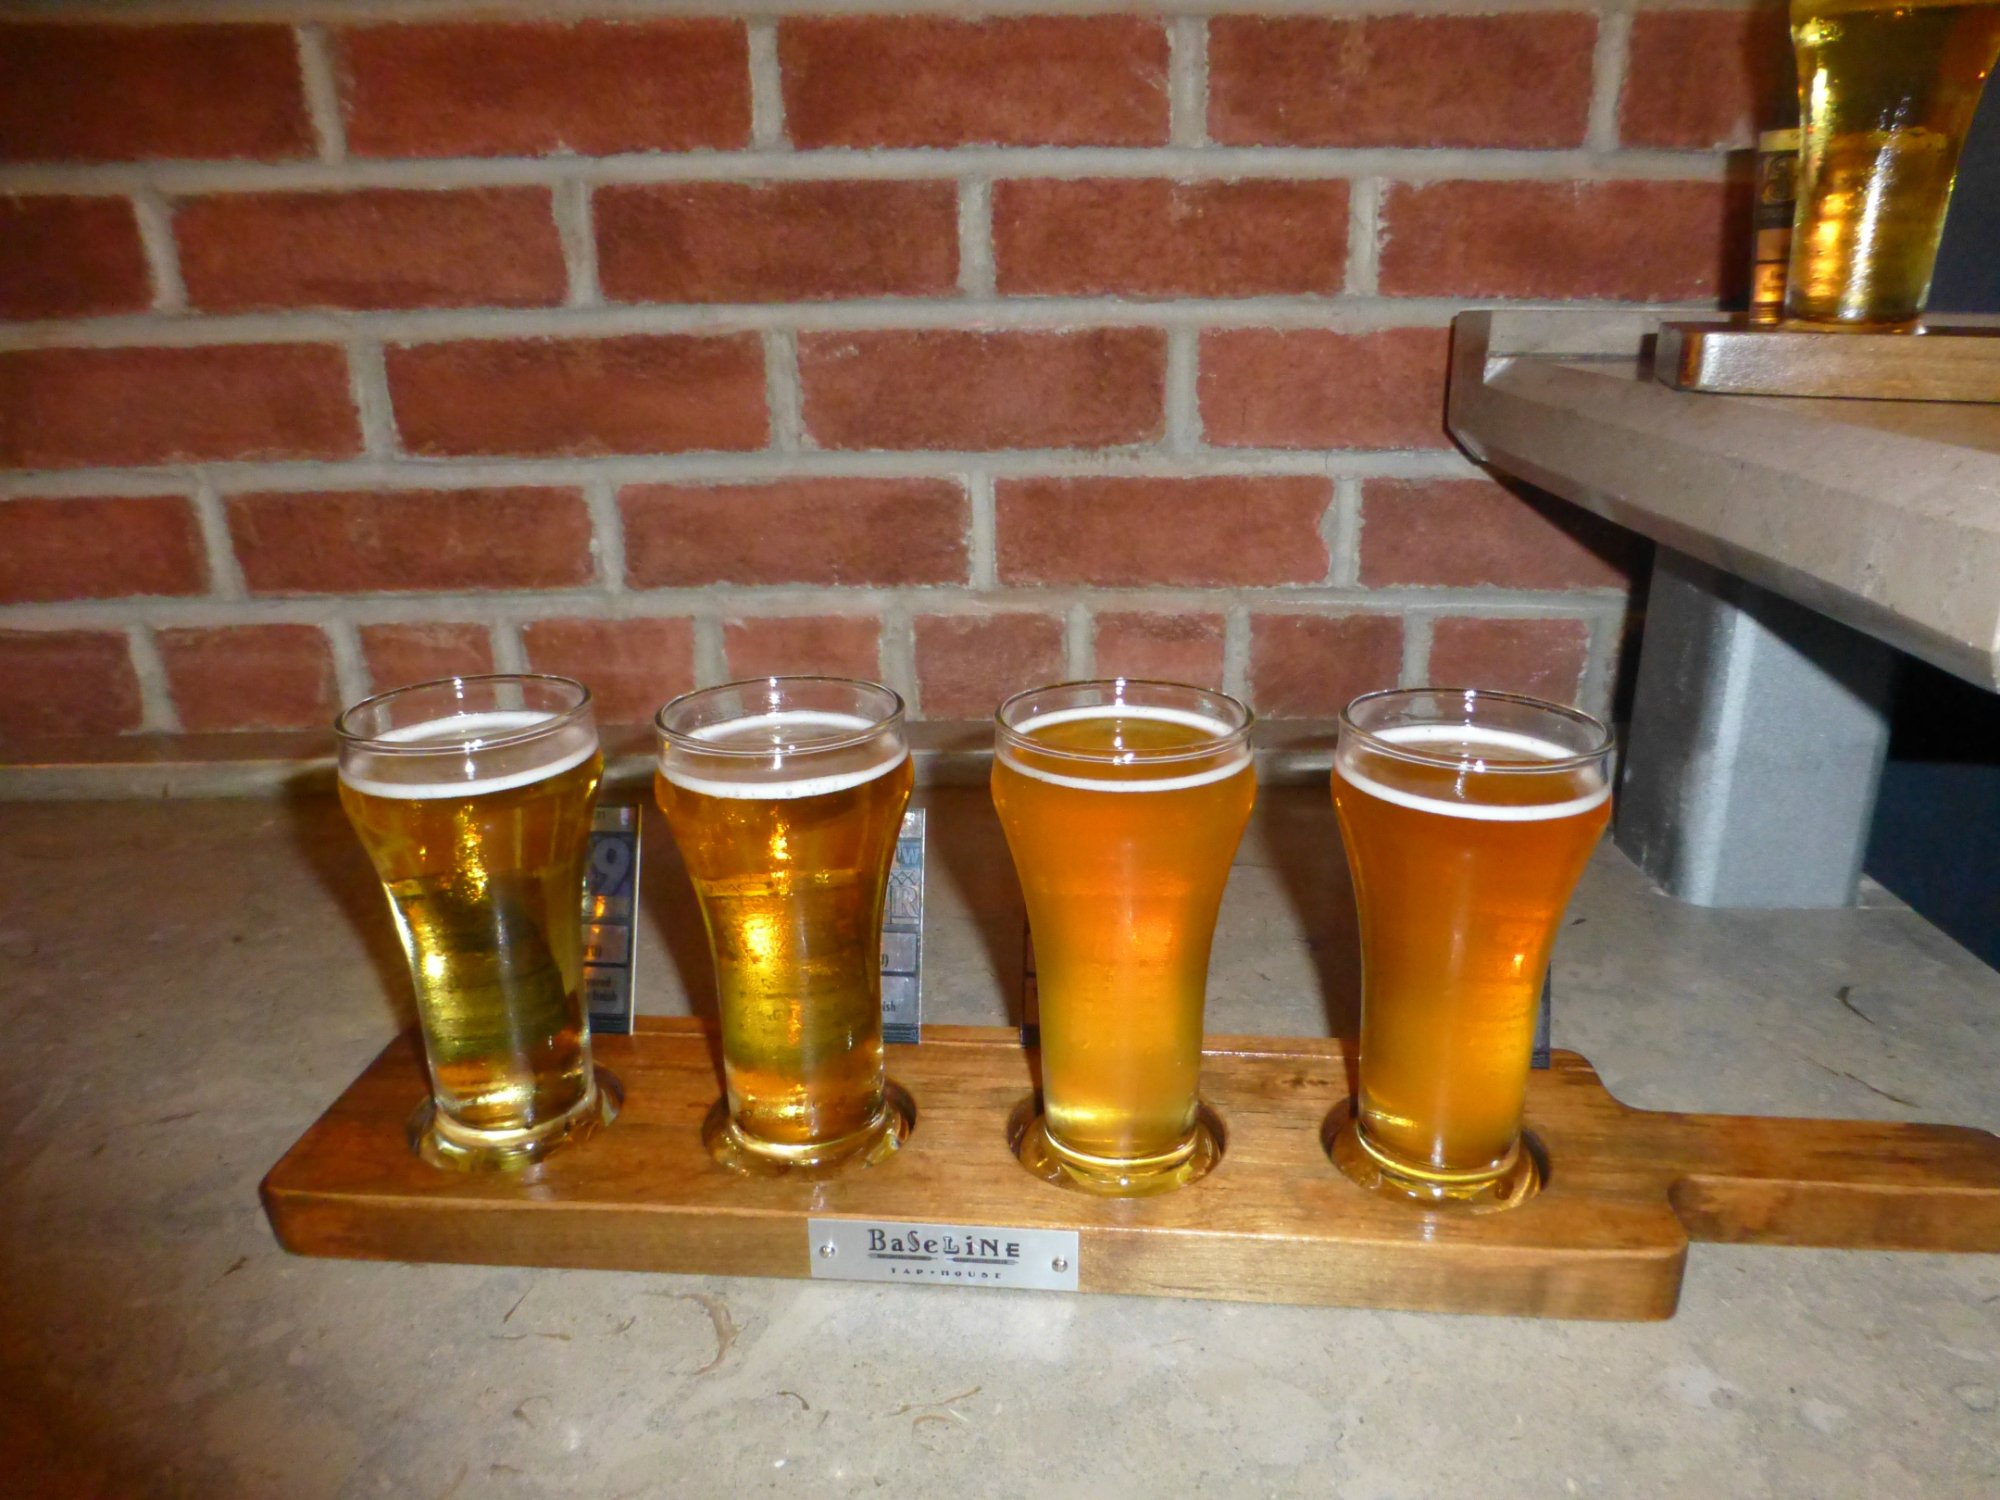 Beer flight Baseline Tap House